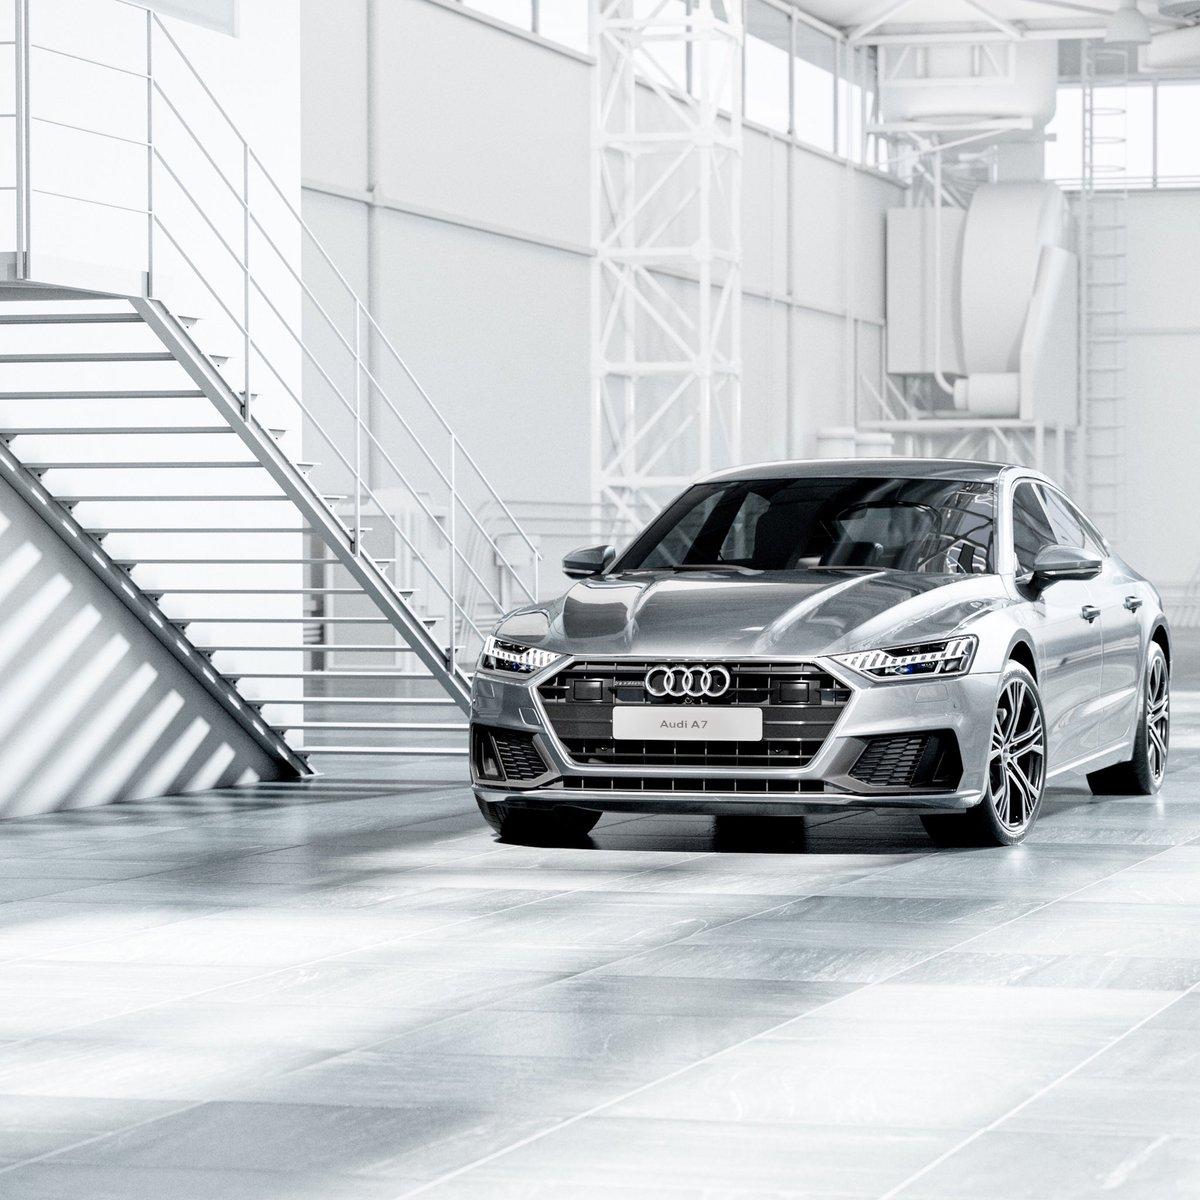 Radiating Confidence  #Audi  #Audisaudiarabia  #AudiA7  #A7  #Vehicles  #Automotive #أودي  #أودي_السعودية  #سيارات